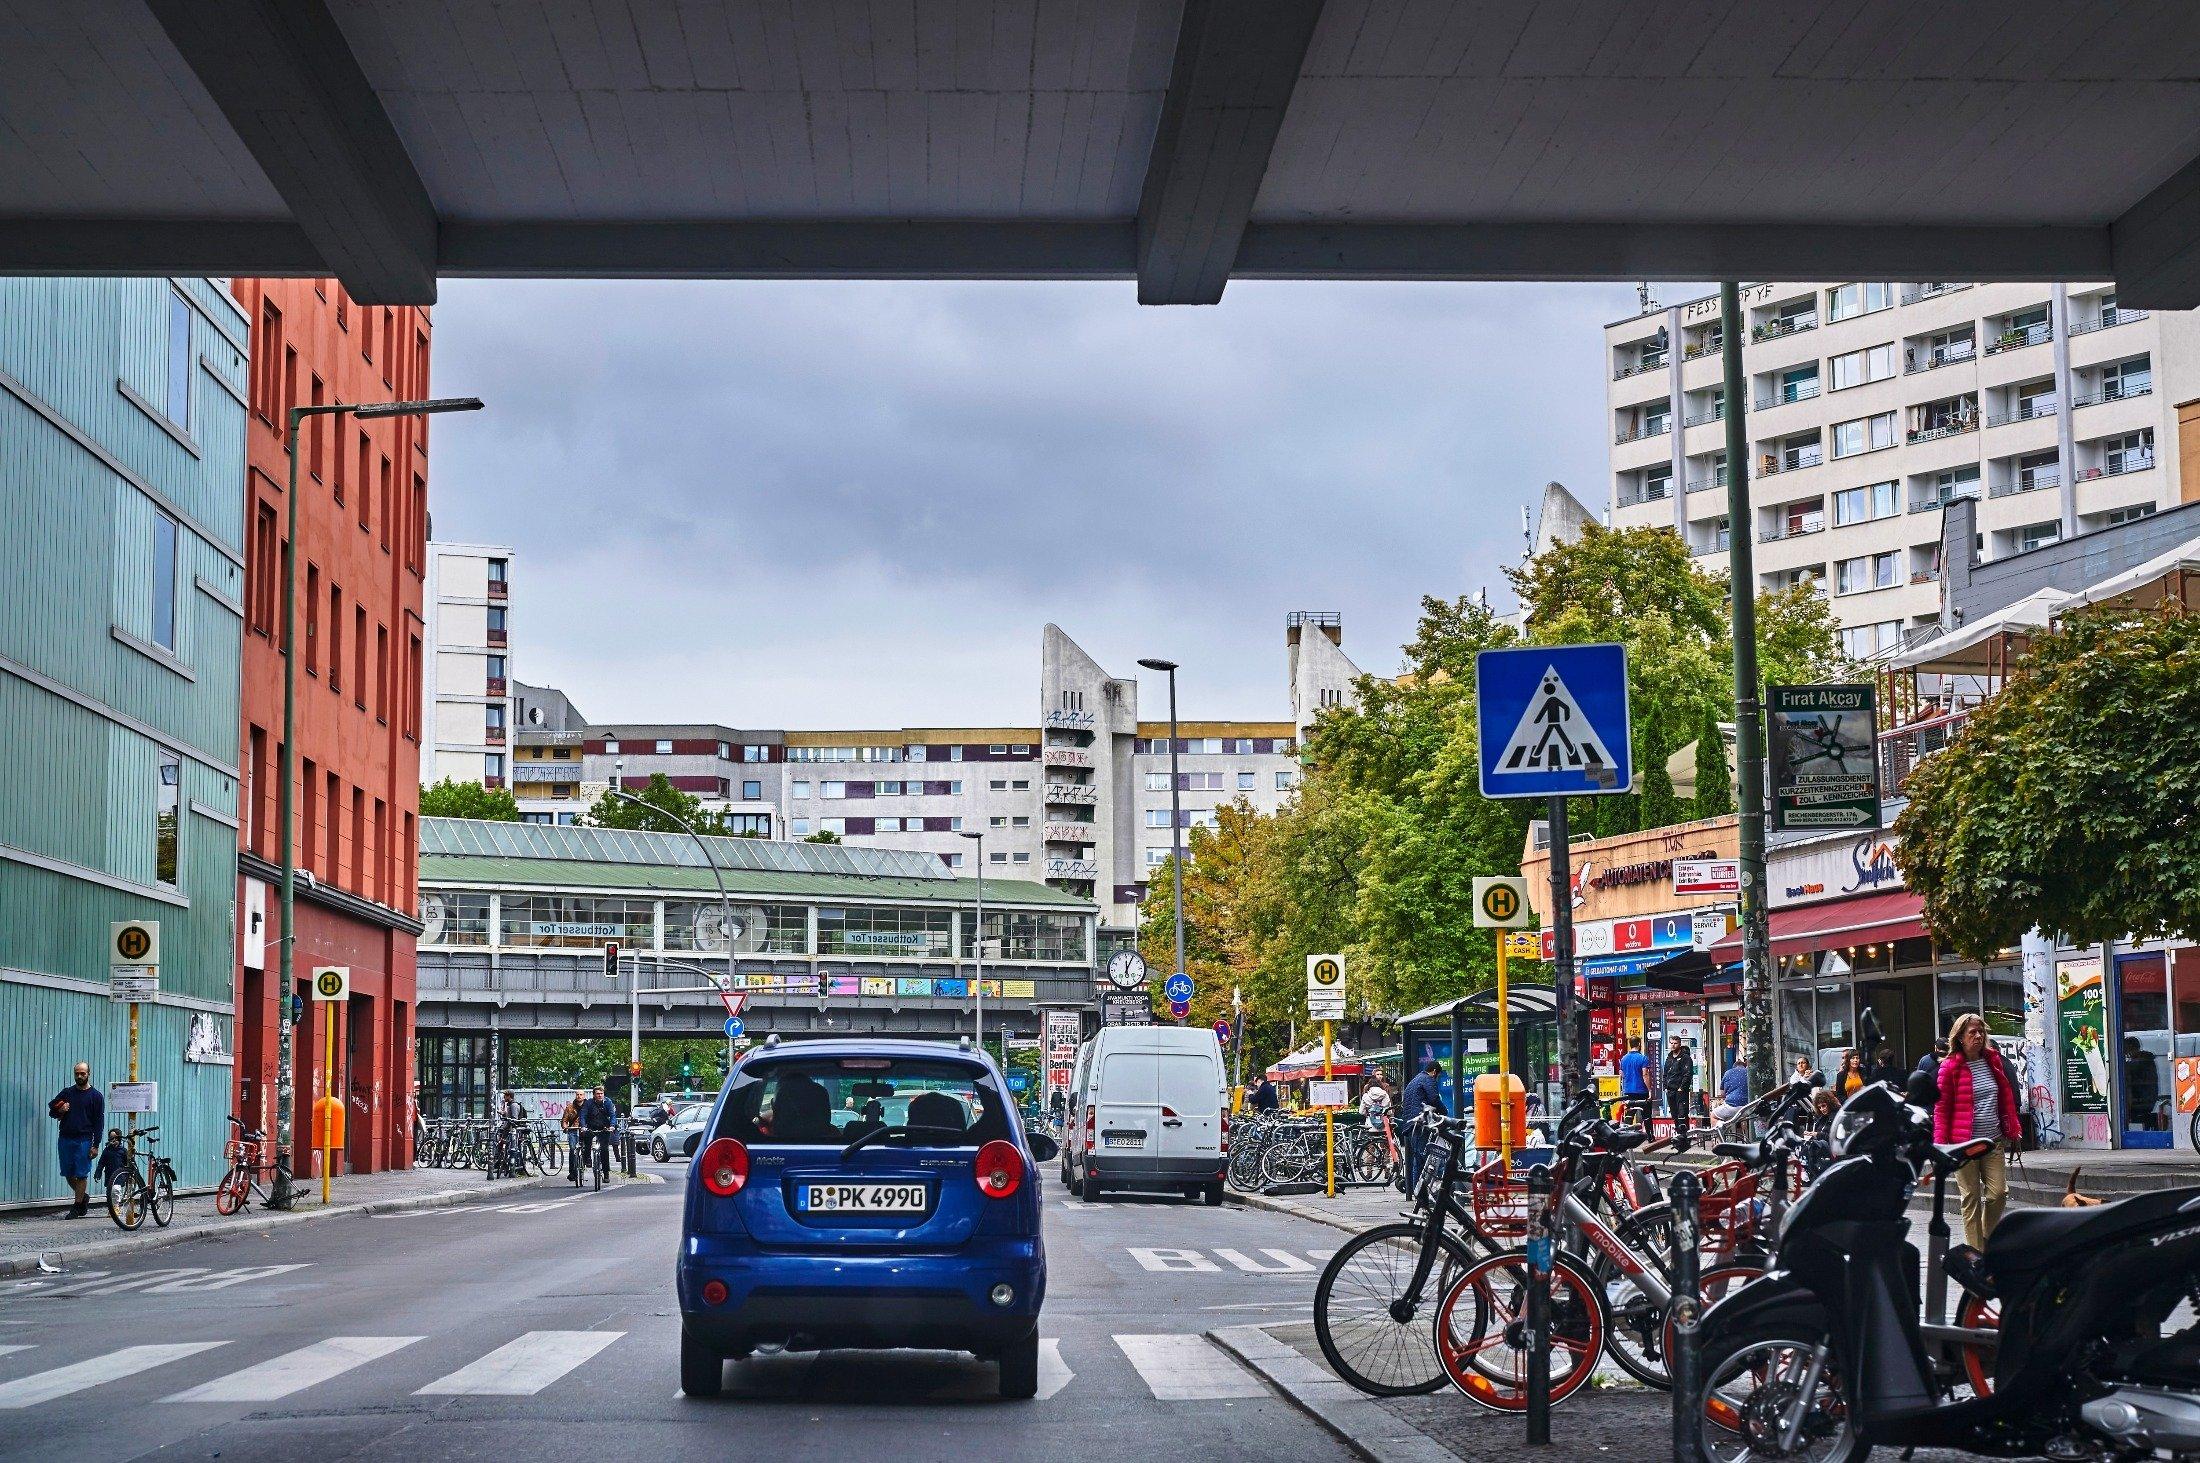 A car passes under the Kottbusser Tor train station in the Kreuzberg district of Berlin, Germany, Sept. 16, 2019. (Shutterstock Photo)